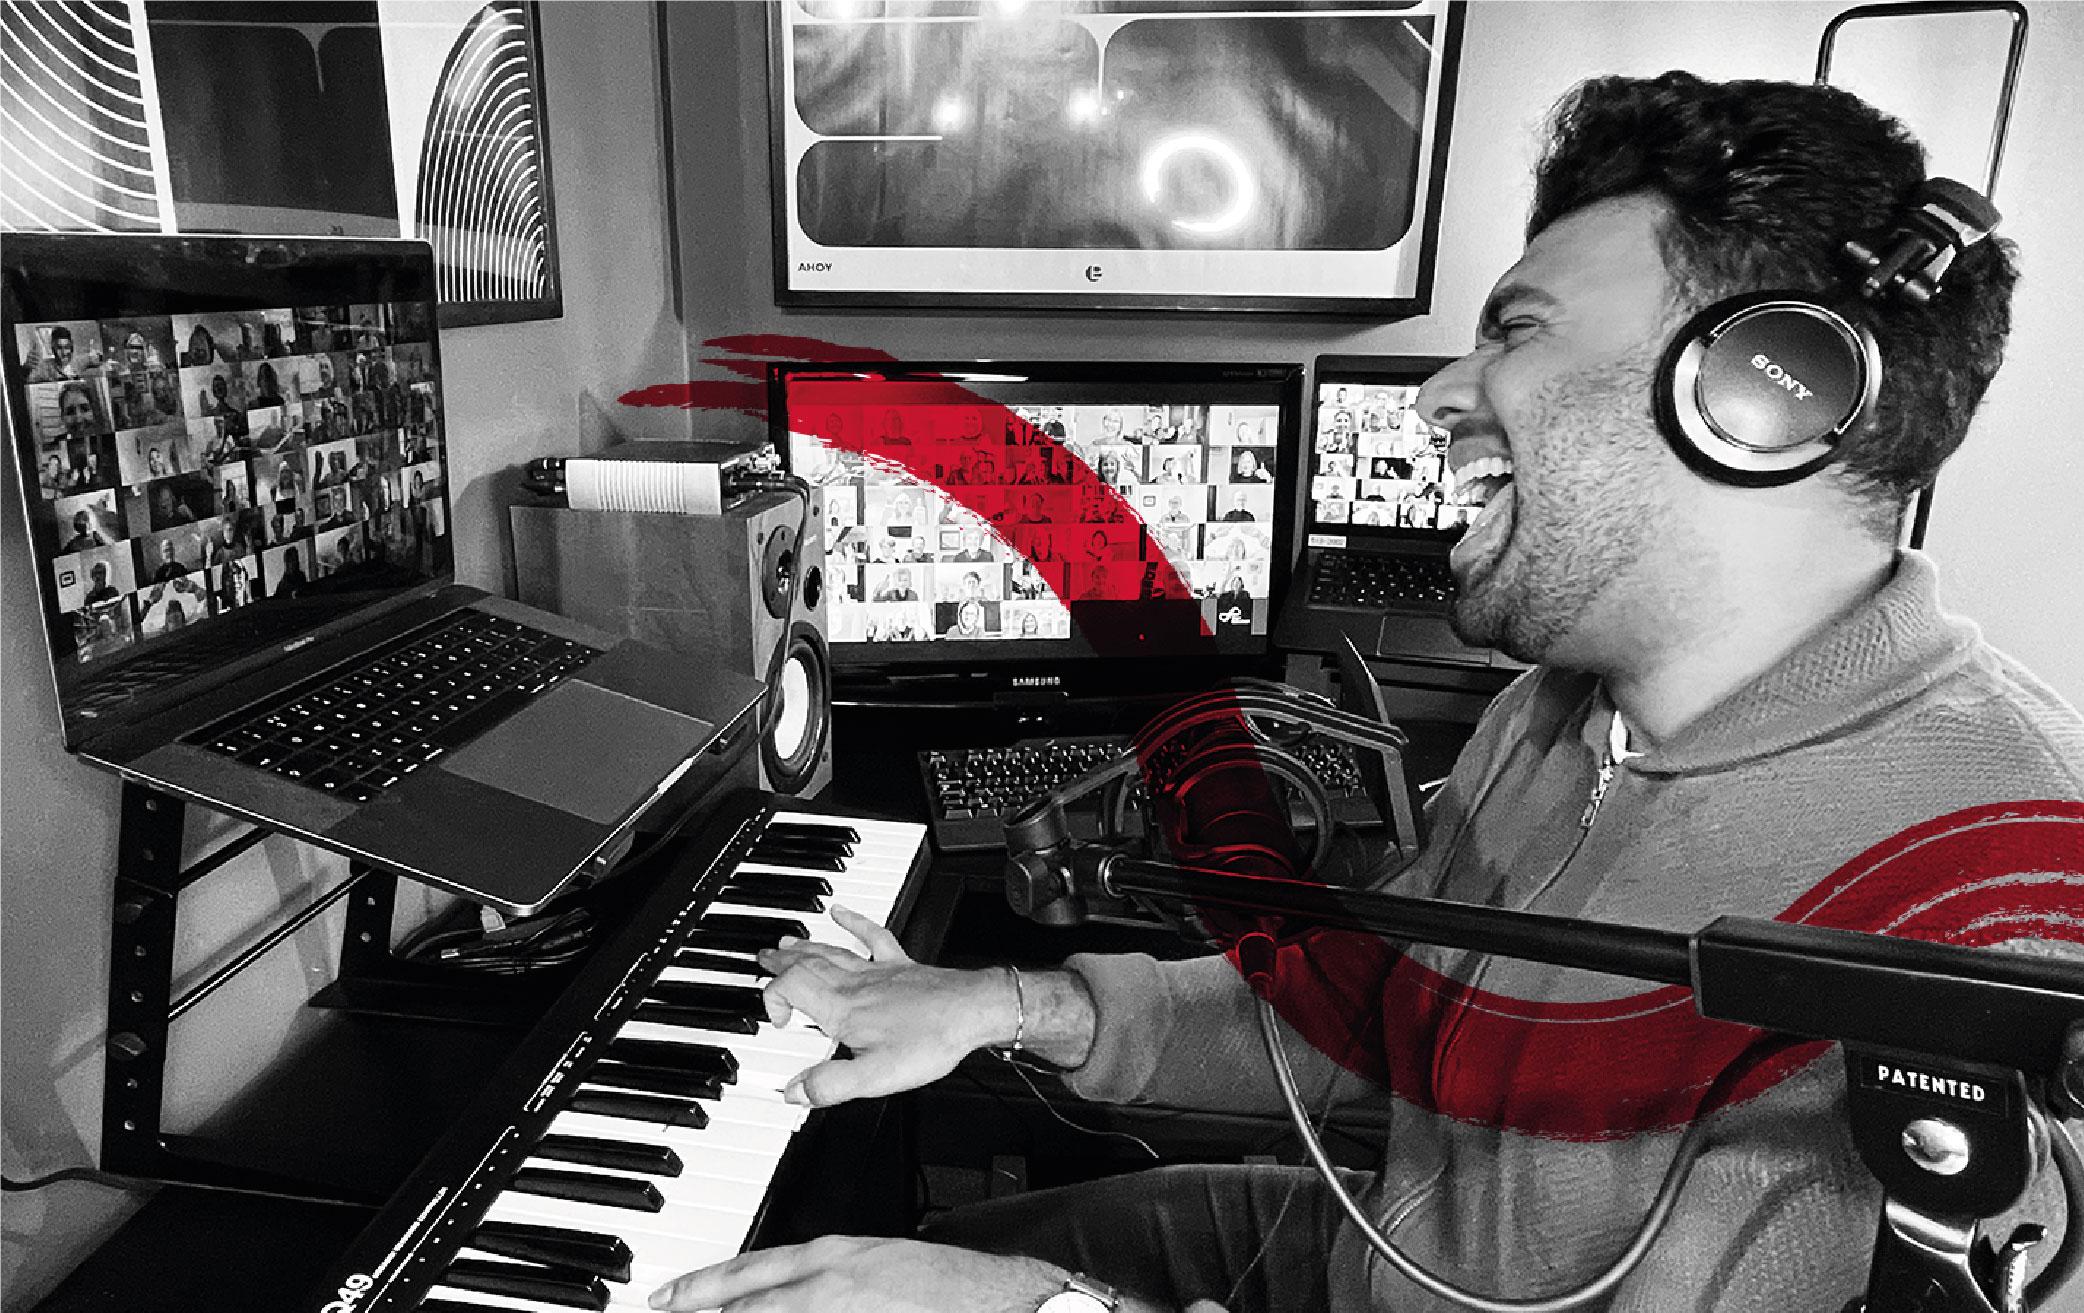 Make Music_Season Web page lead image-02